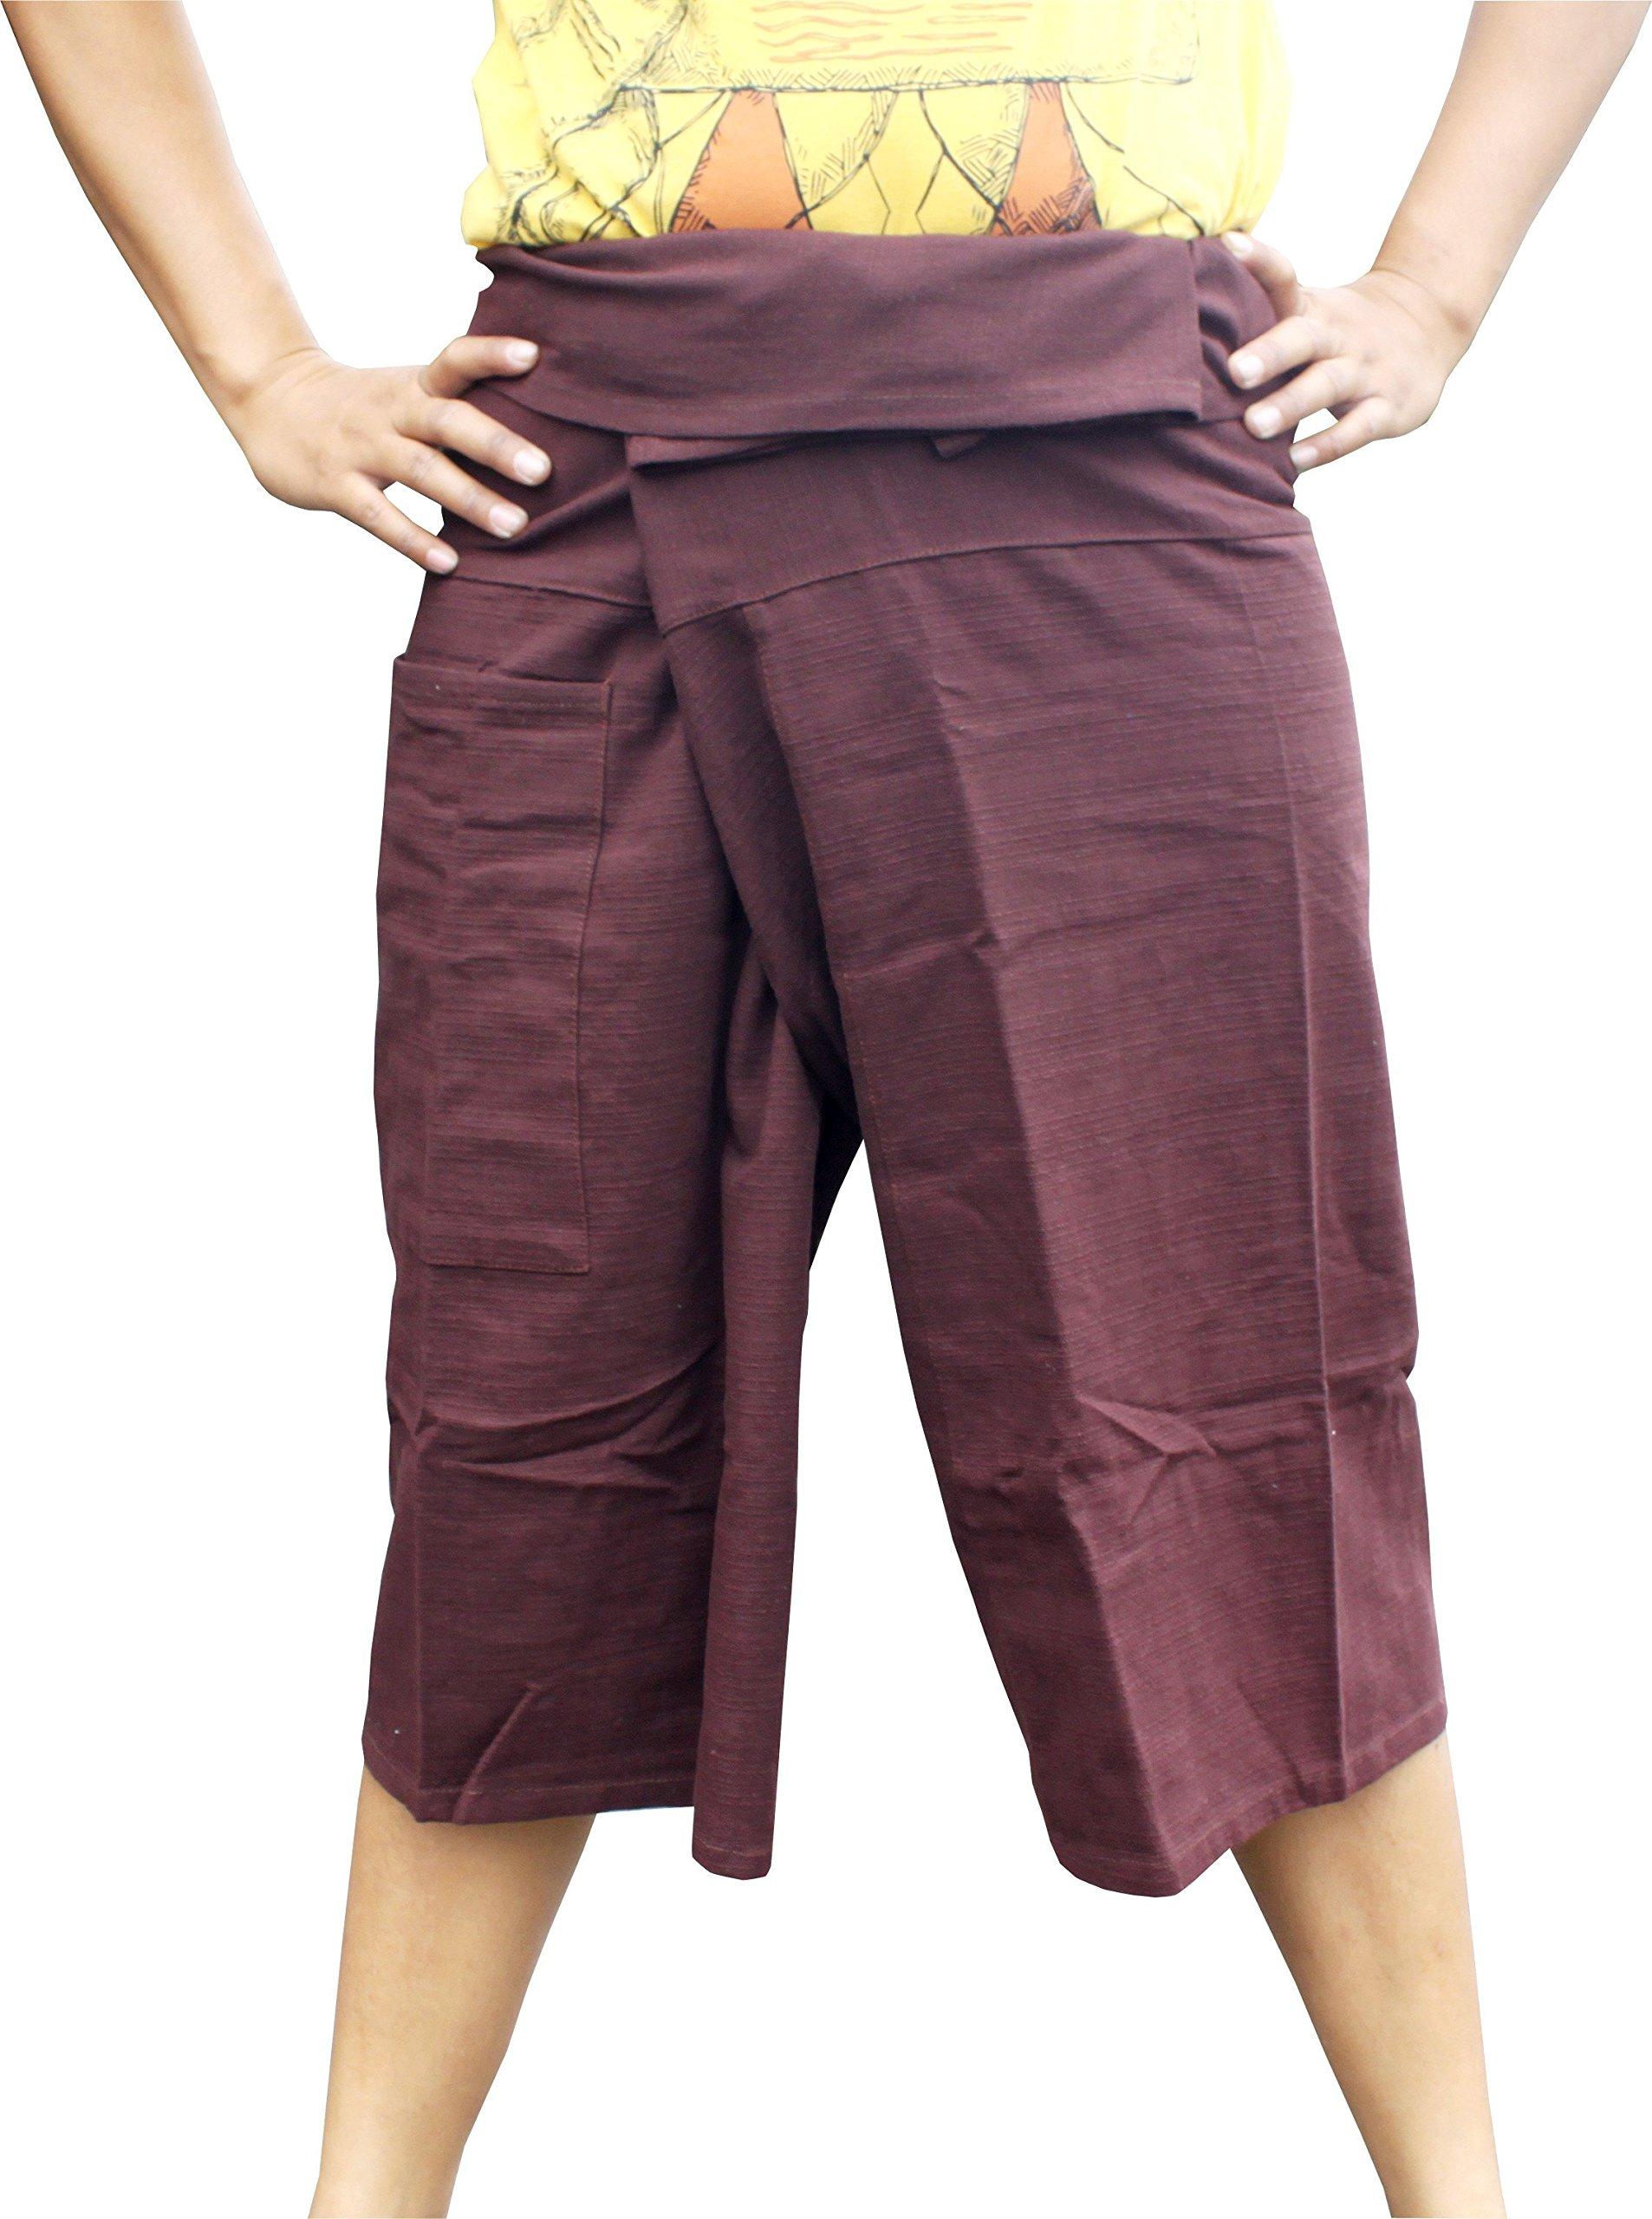 Raan Pah Muang Brand Thick Line Cotton Thai Fisherman Capri Wrap Pants, X-Large, Sienna Brown by Raan Pah Muang